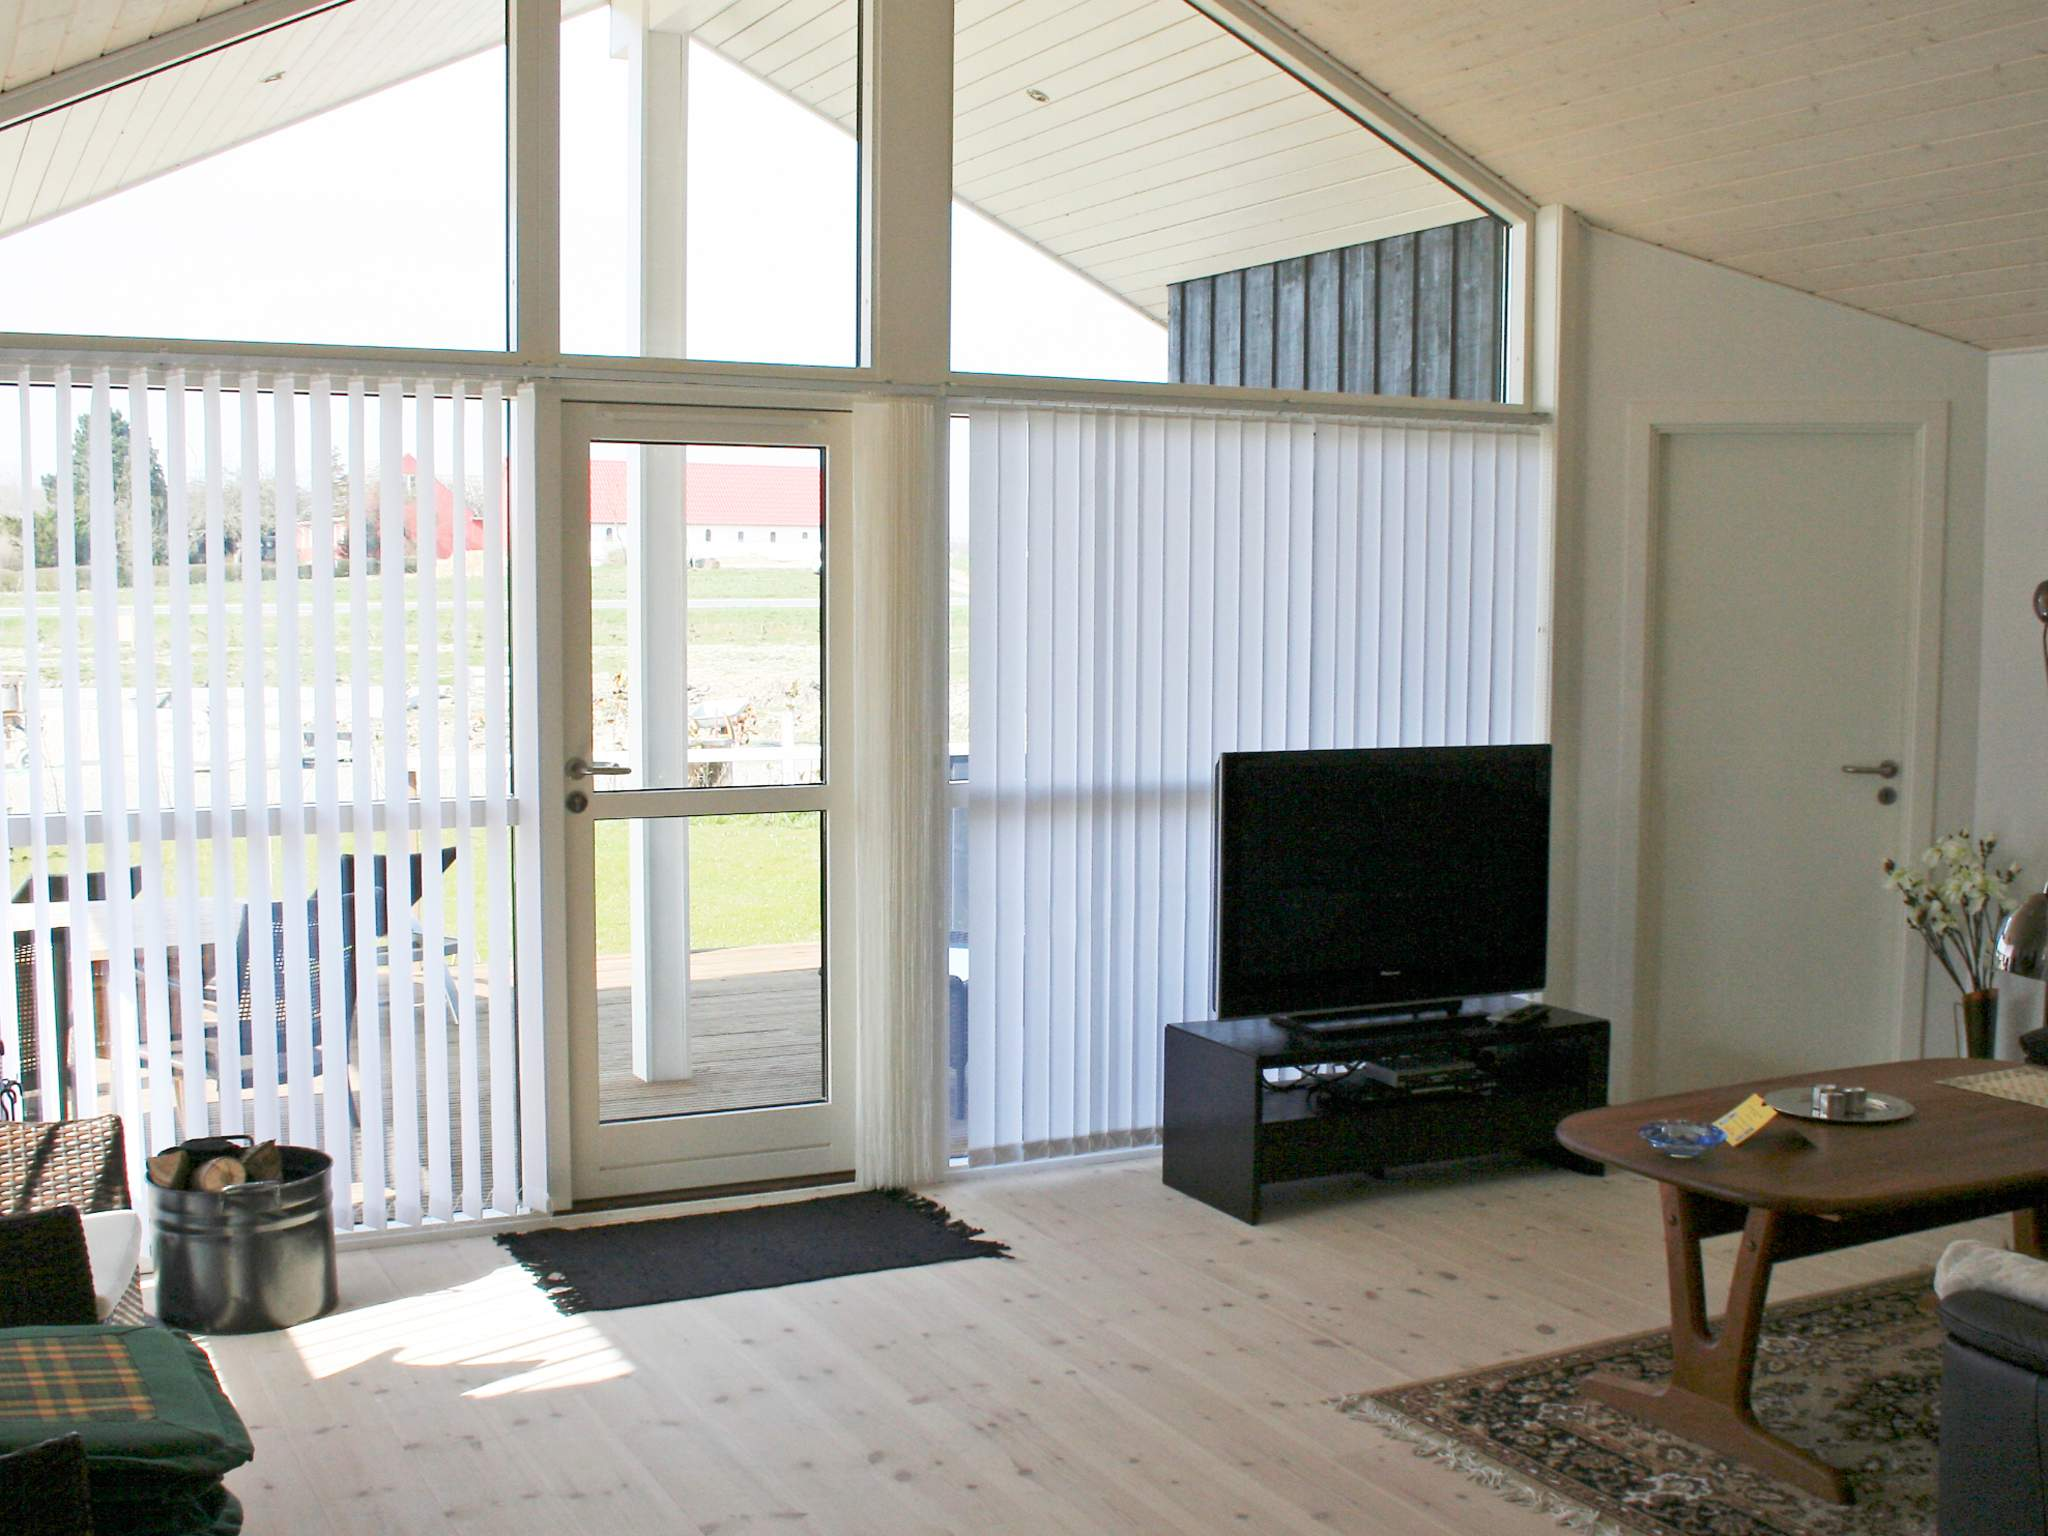 Ferienhaus Balka Strand (334426), Balke, , Bornholm, Dänemark, Bild 1